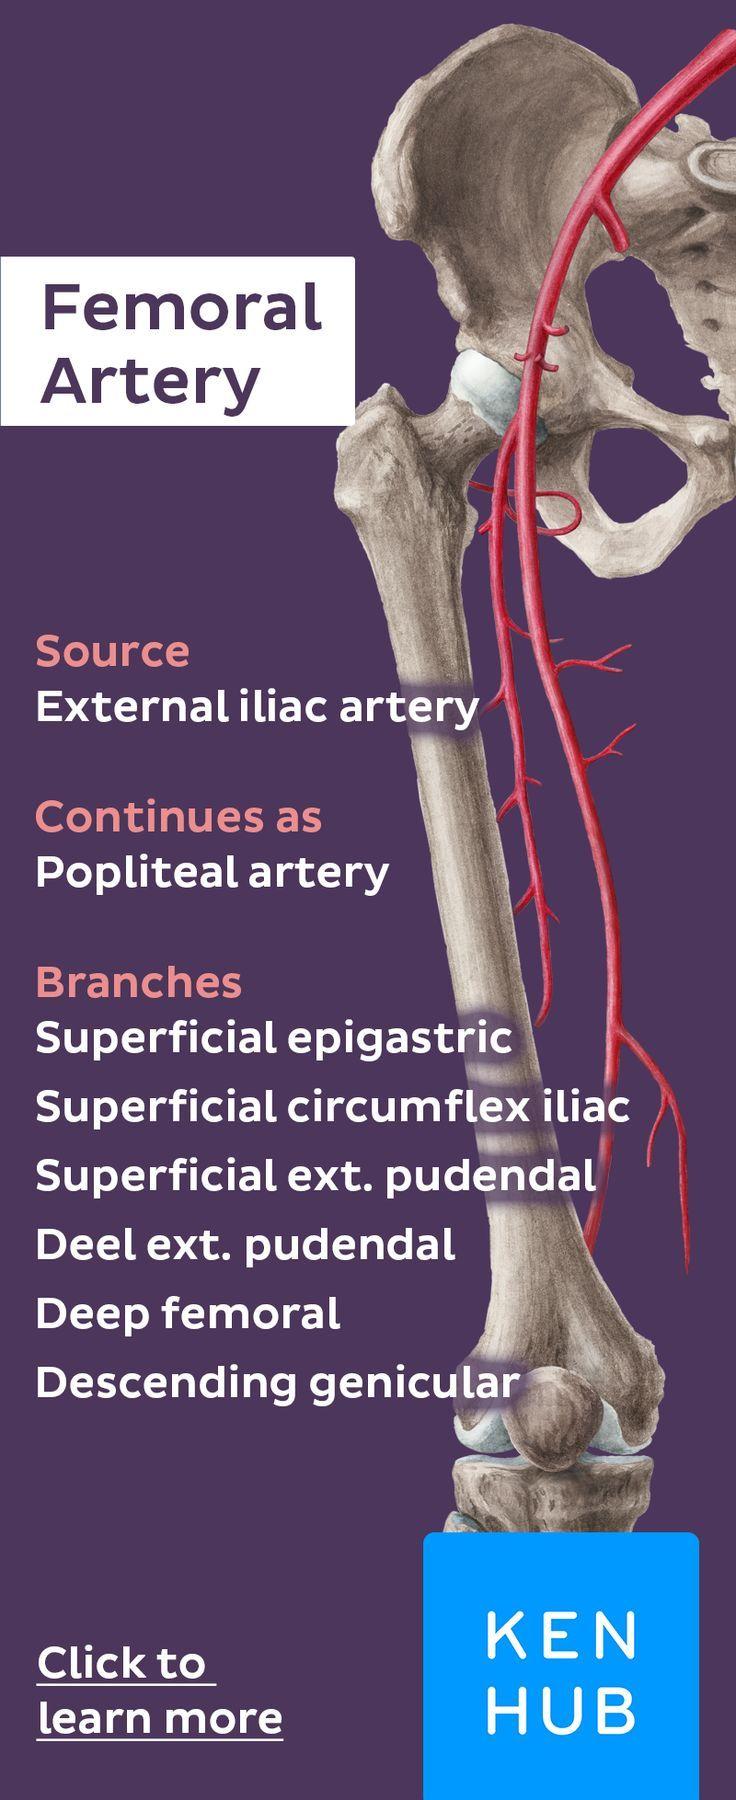 Femoral Artery Health Anatomy Physiology Arteries Anatomy